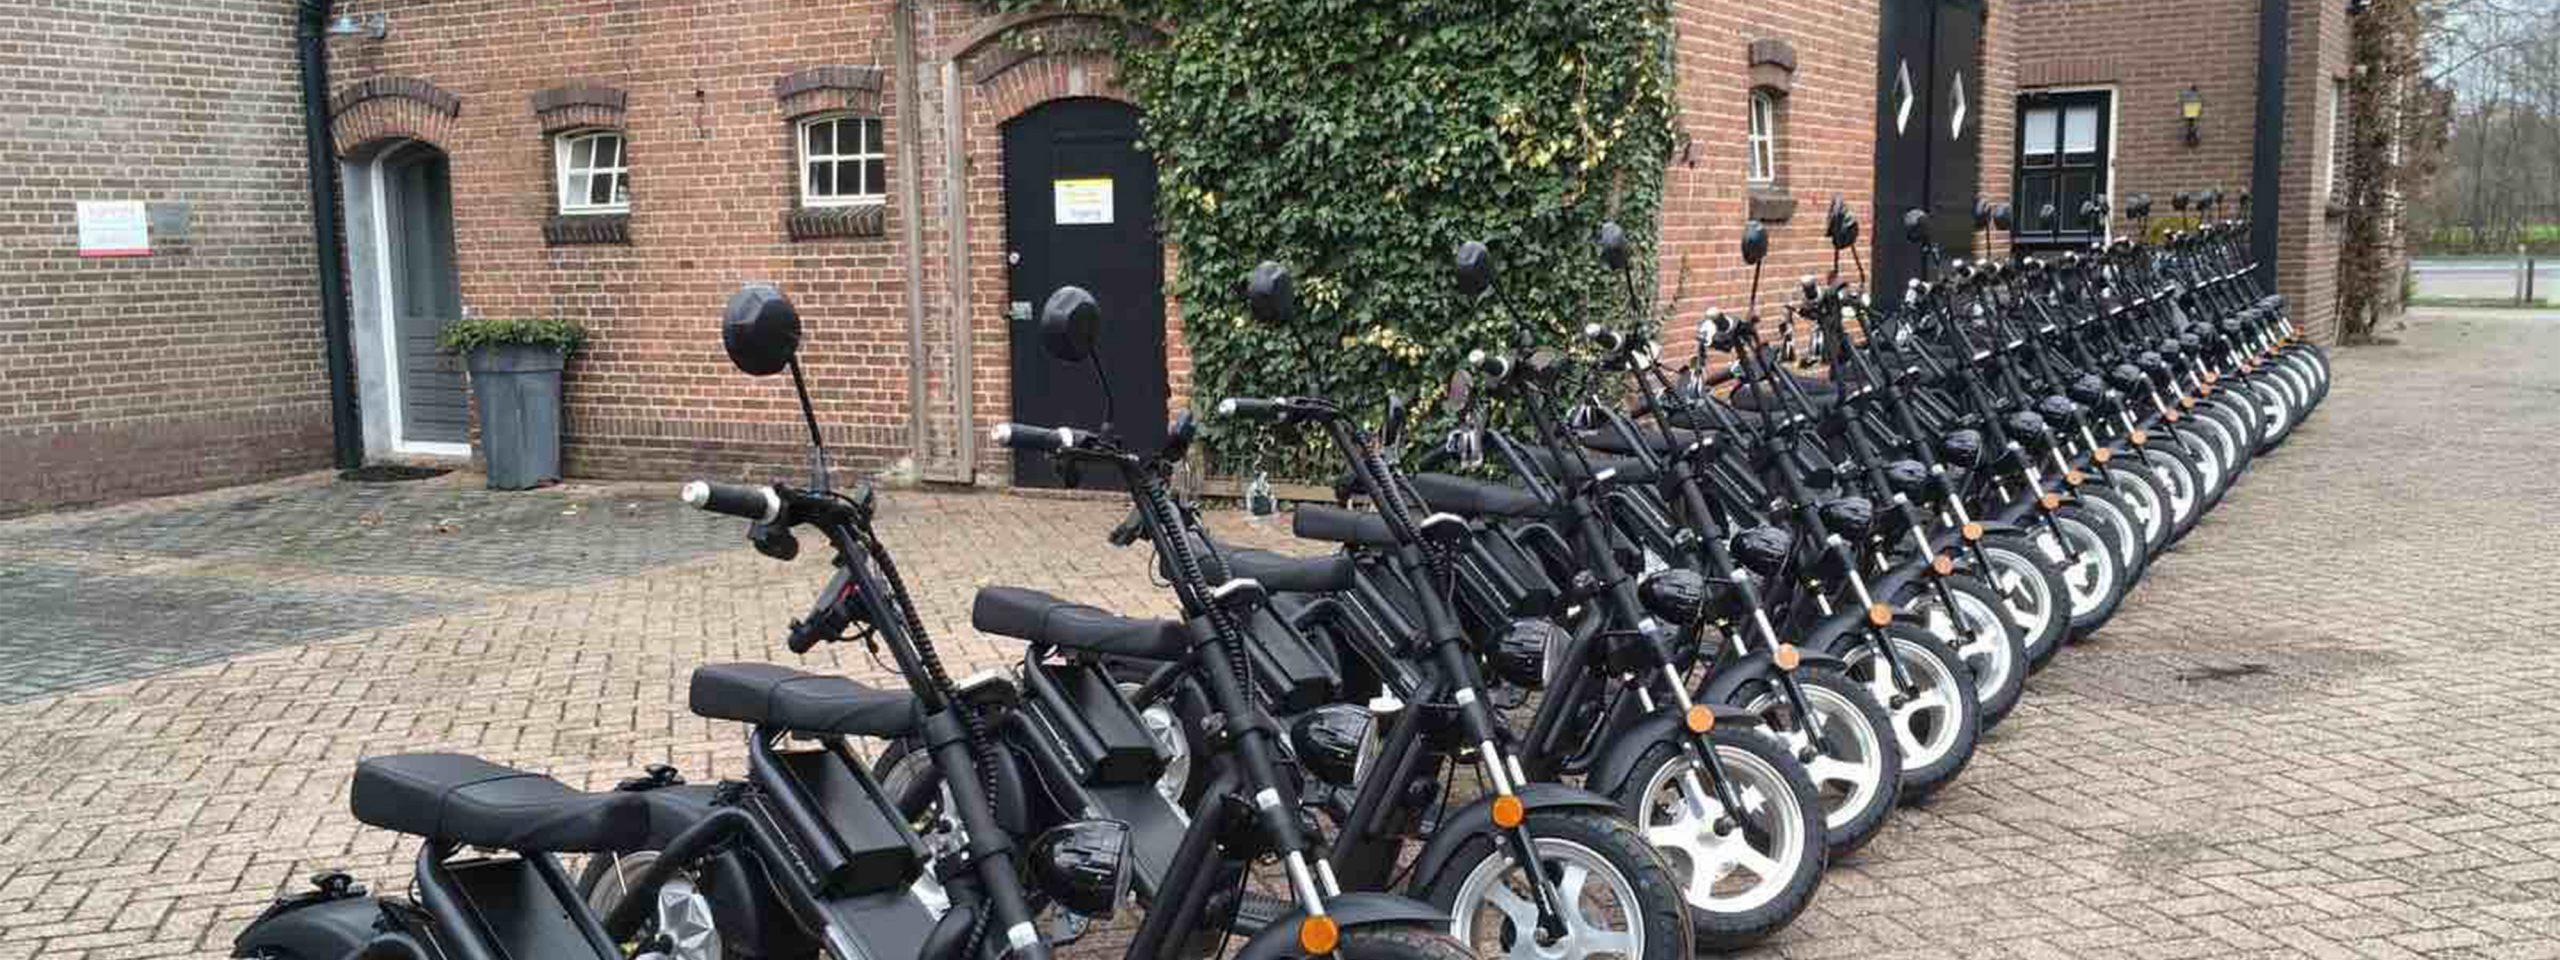 eindhoven-bedrijfsuitje -scooter-tour